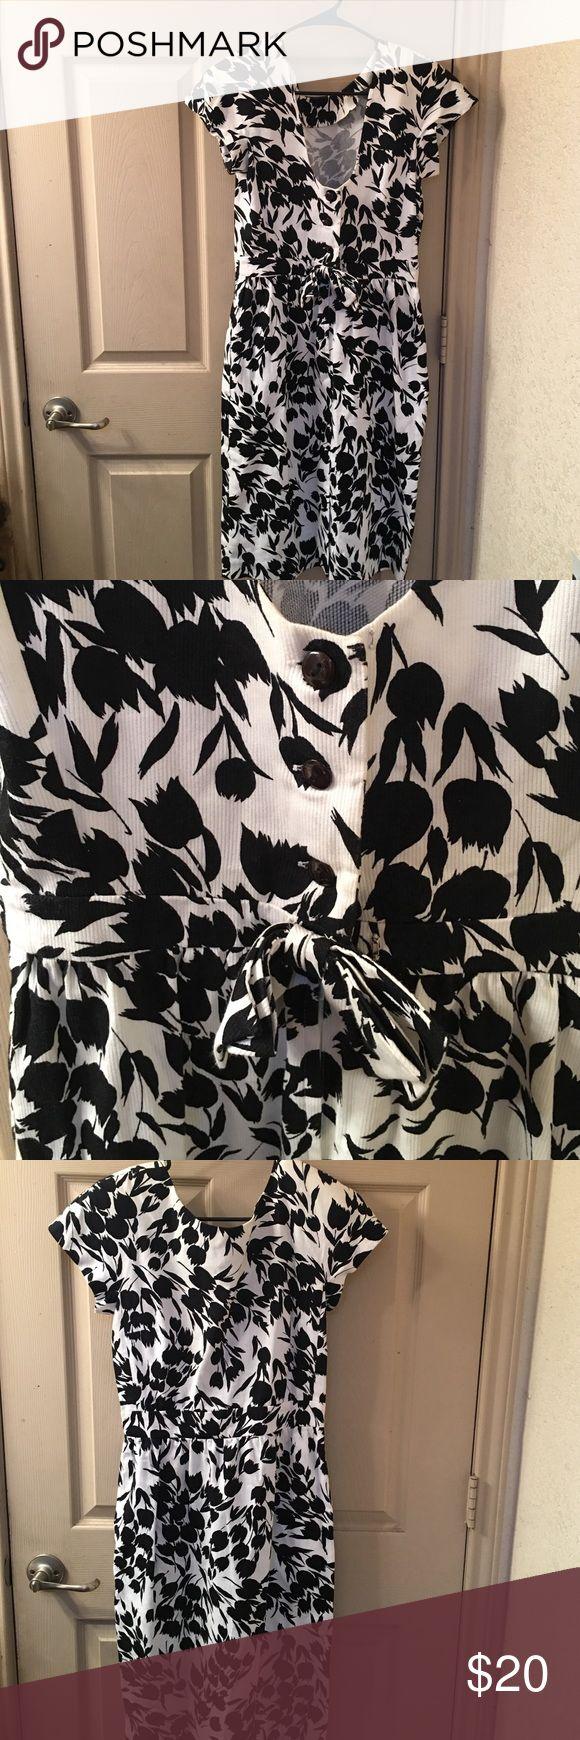 Liz Claiborne tulips dress Liz Claiborne dress in black and white tulip dress very cute. Liz Claiborne Dresses